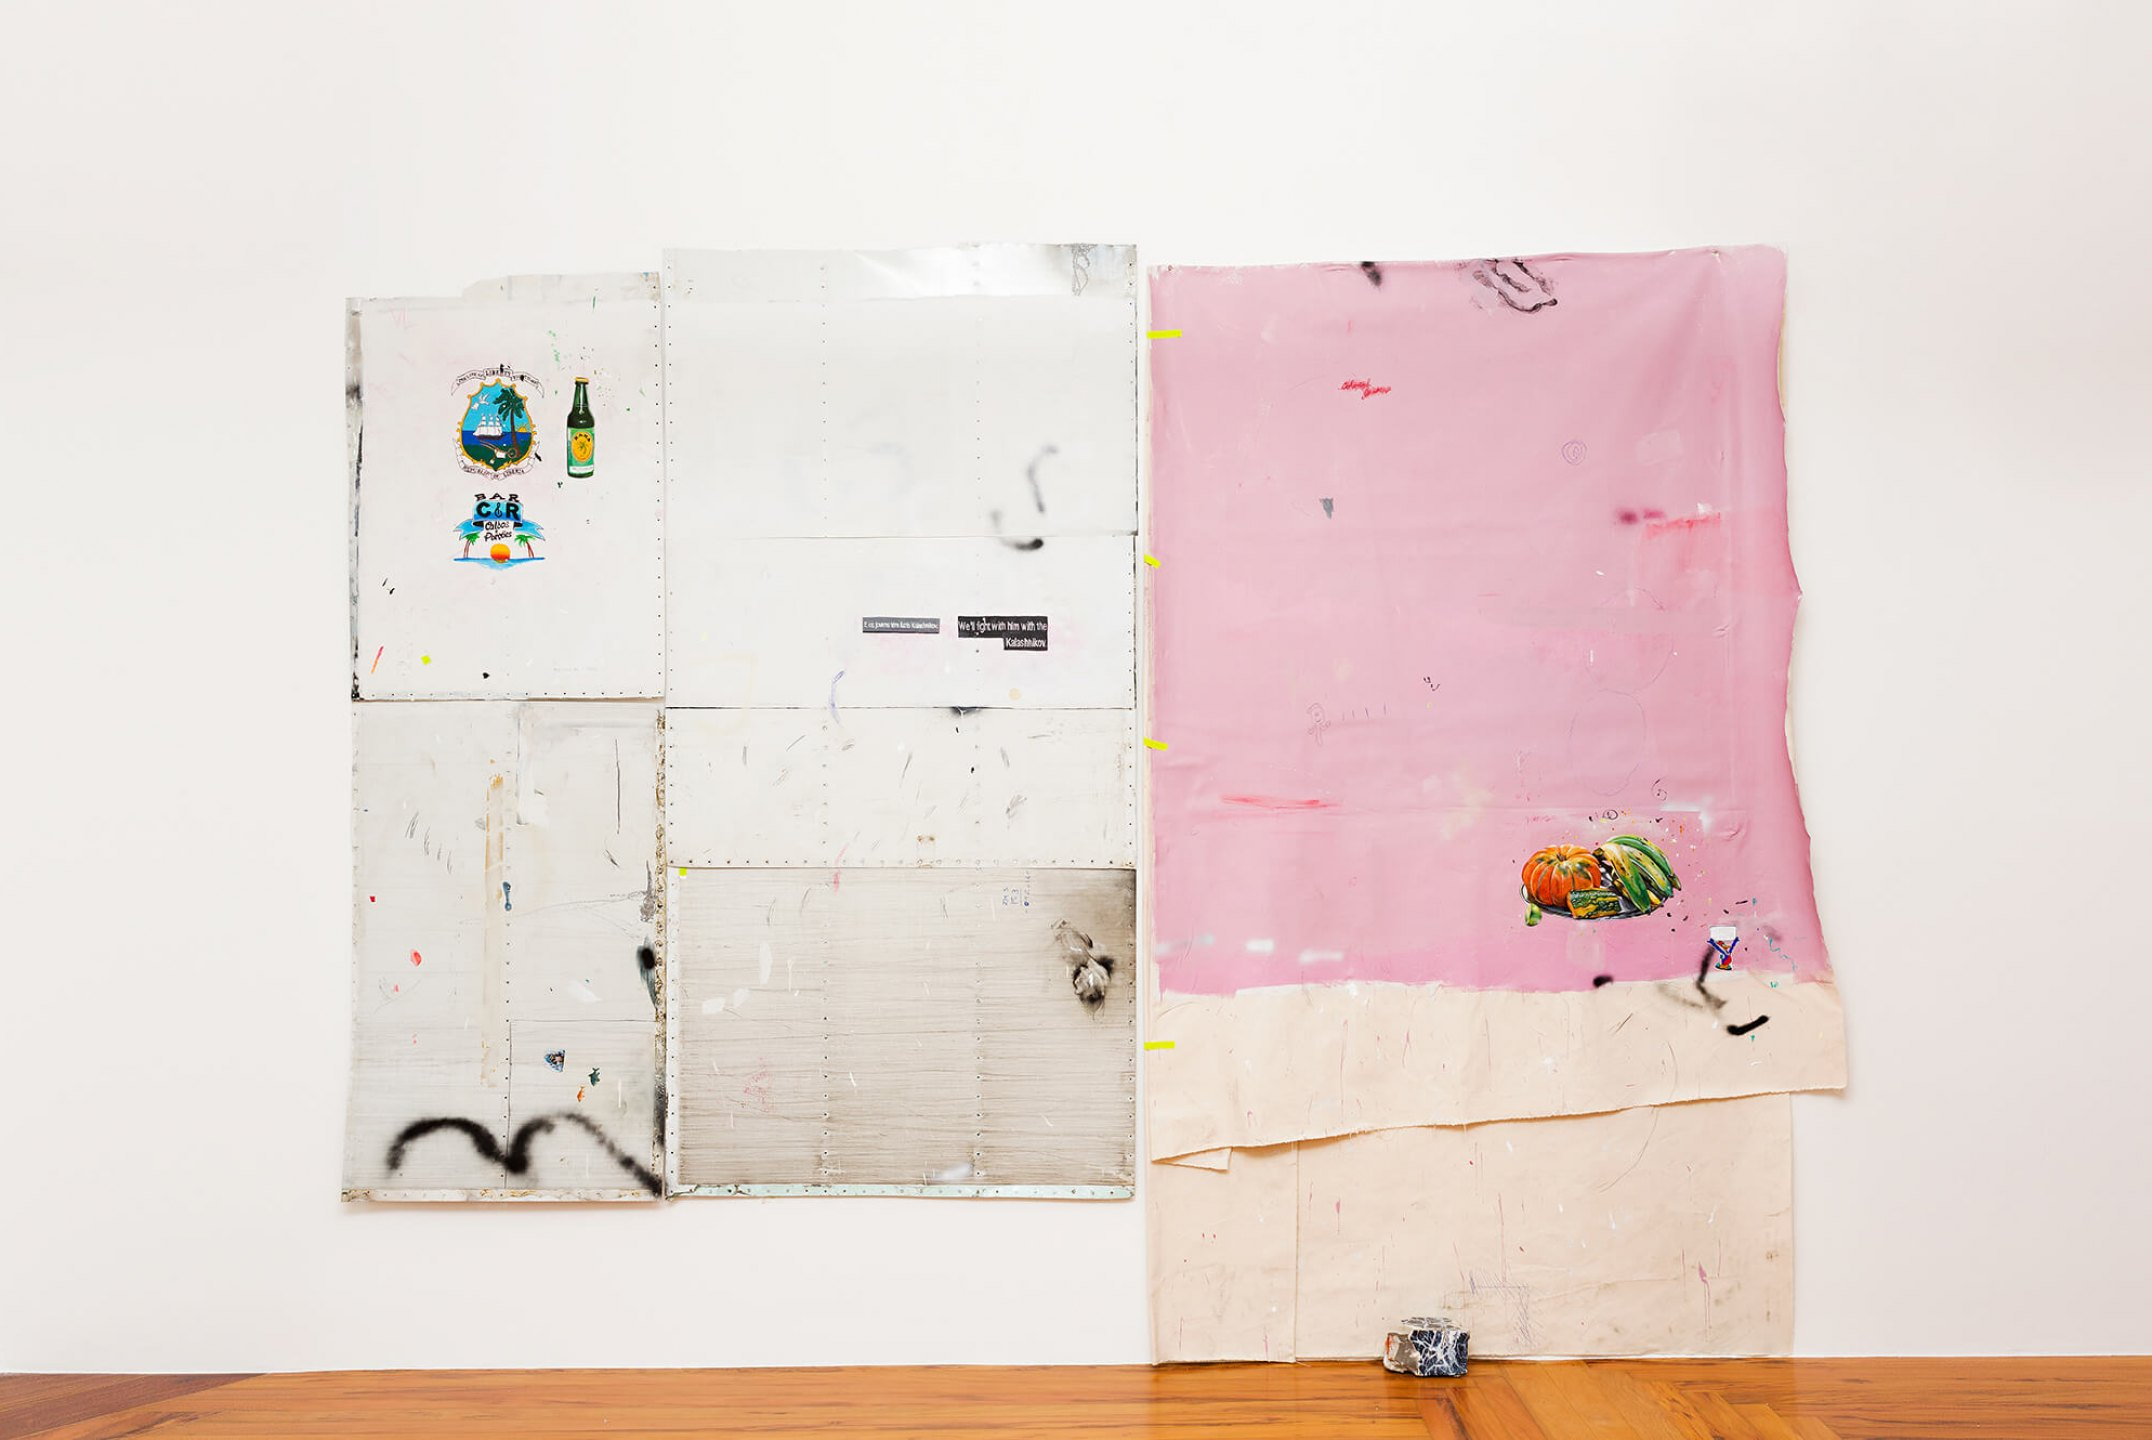 Paulo Nimer Pjota,&nbsp;<em>Offering, landscape and war, 2014,&nbsp;</em>acrylic, pencil, pen, synthetic enamel on aluminium, canvas,&nbsp; on canvas, concrete and brick,&nbsp;285 x 380 cm - Mendes Wood DM